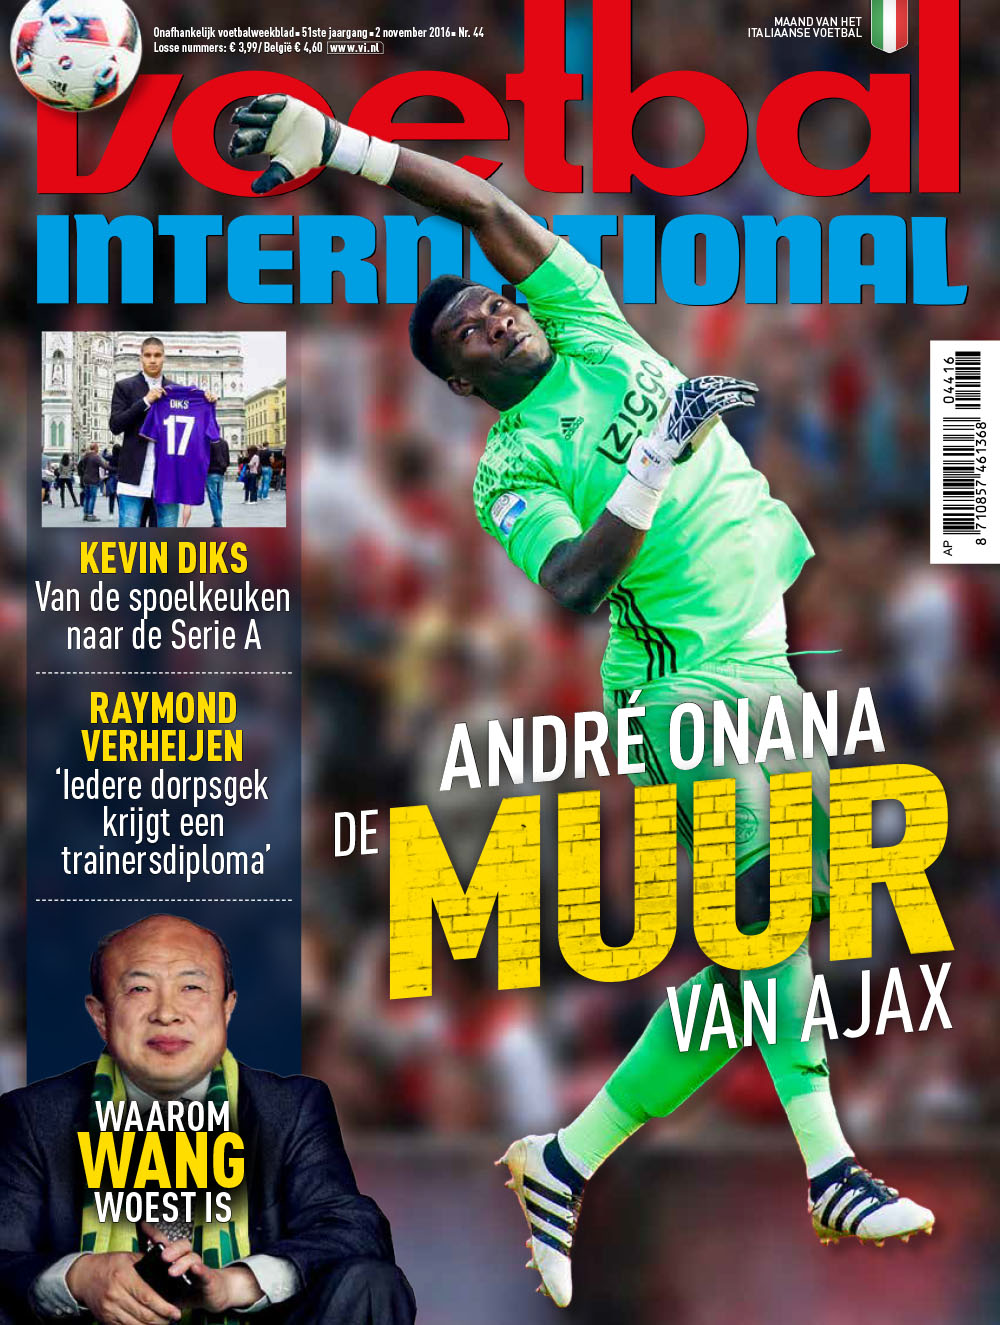 Cover VI 44-2016 - Landelijk